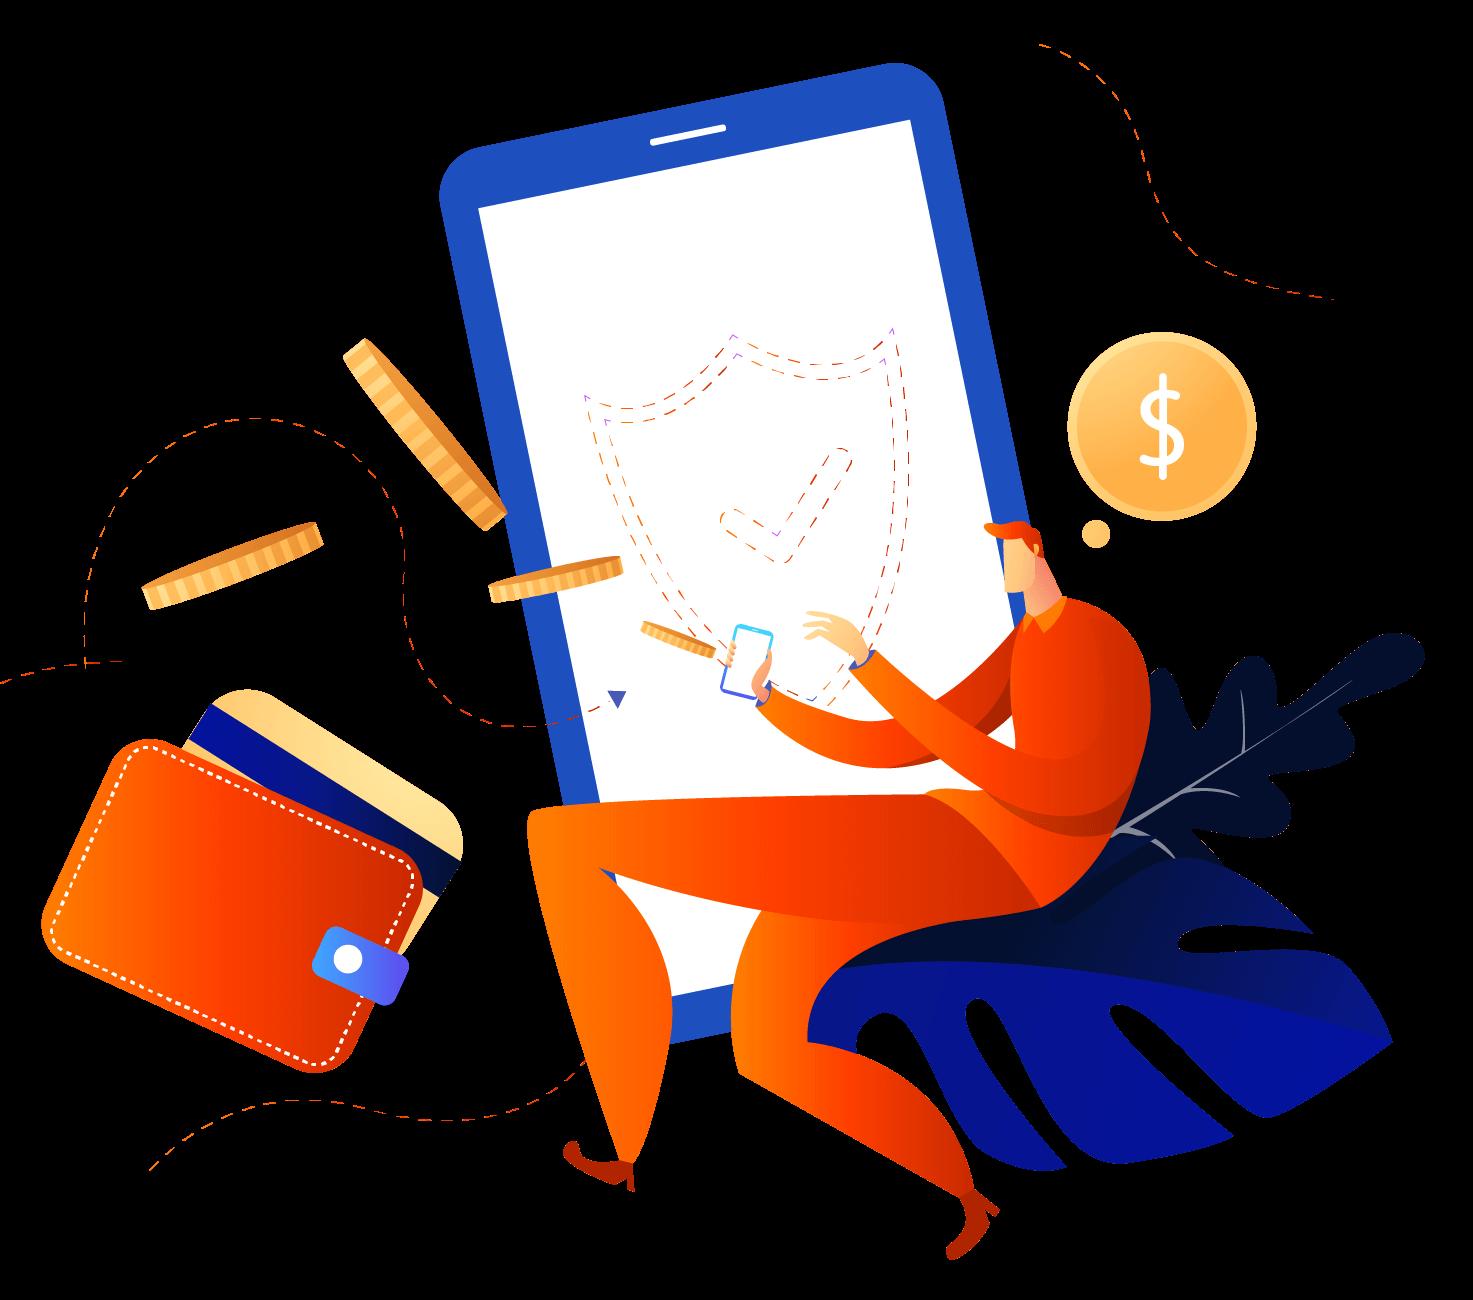 cooperlink-portabilidade-de-financiamento